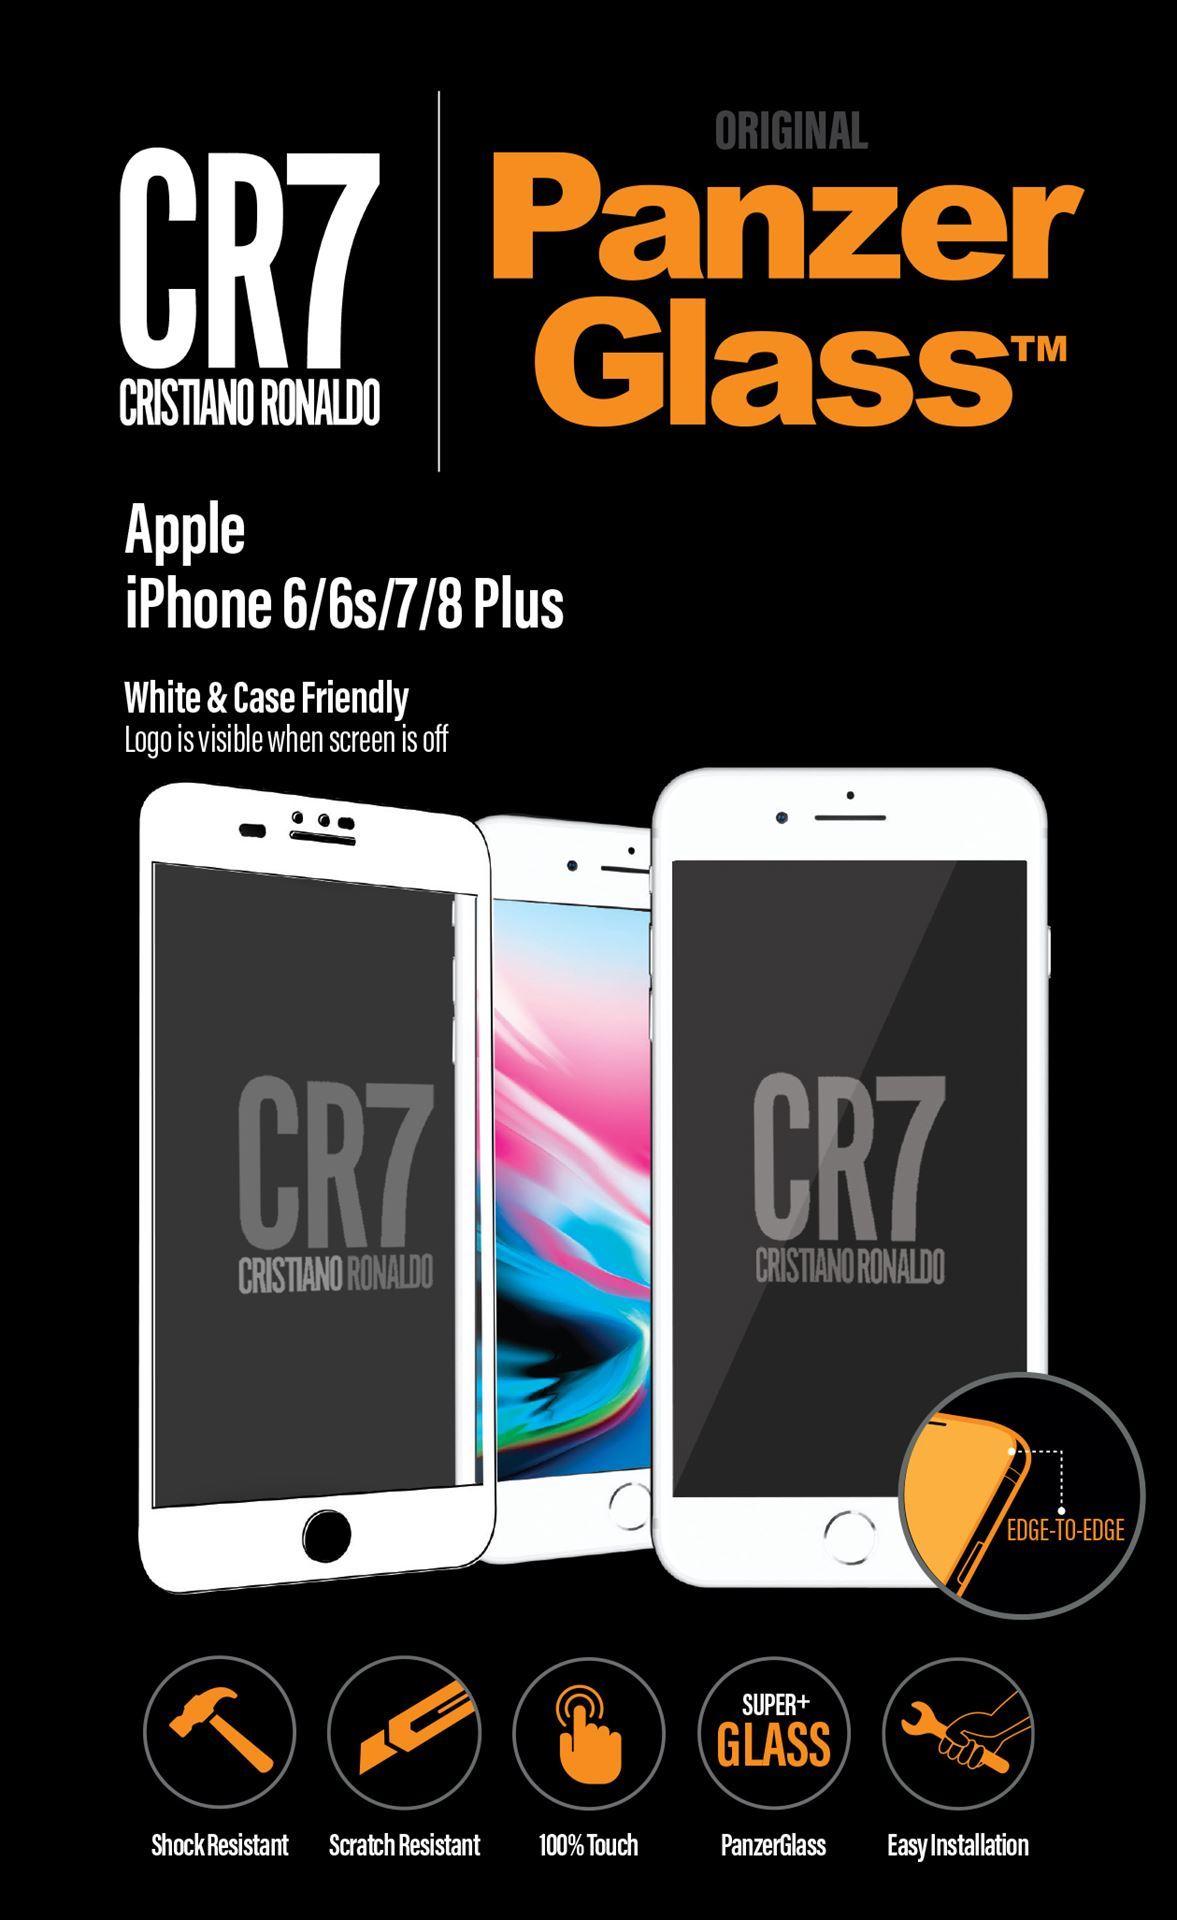 0003502_panzerglass-iphone-66s788-plus-cr7-screen-protector.jpeg